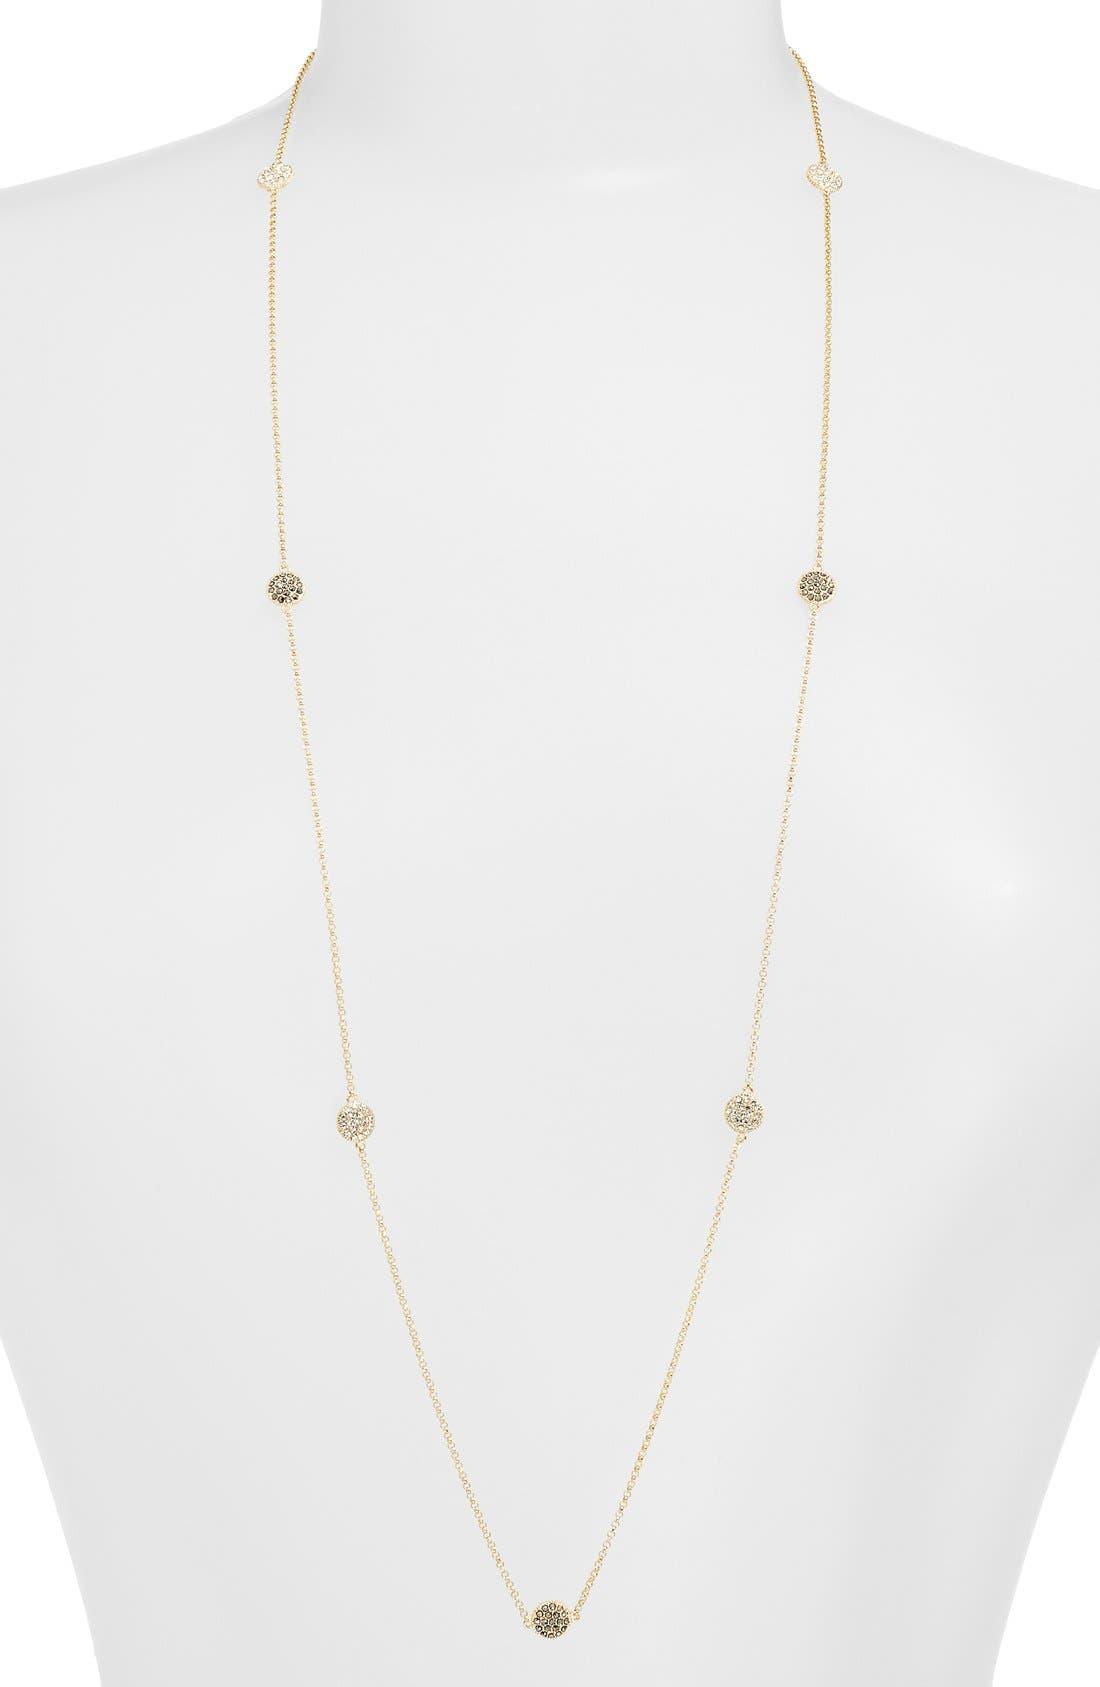 Judith Jack Long Illusion Necklace